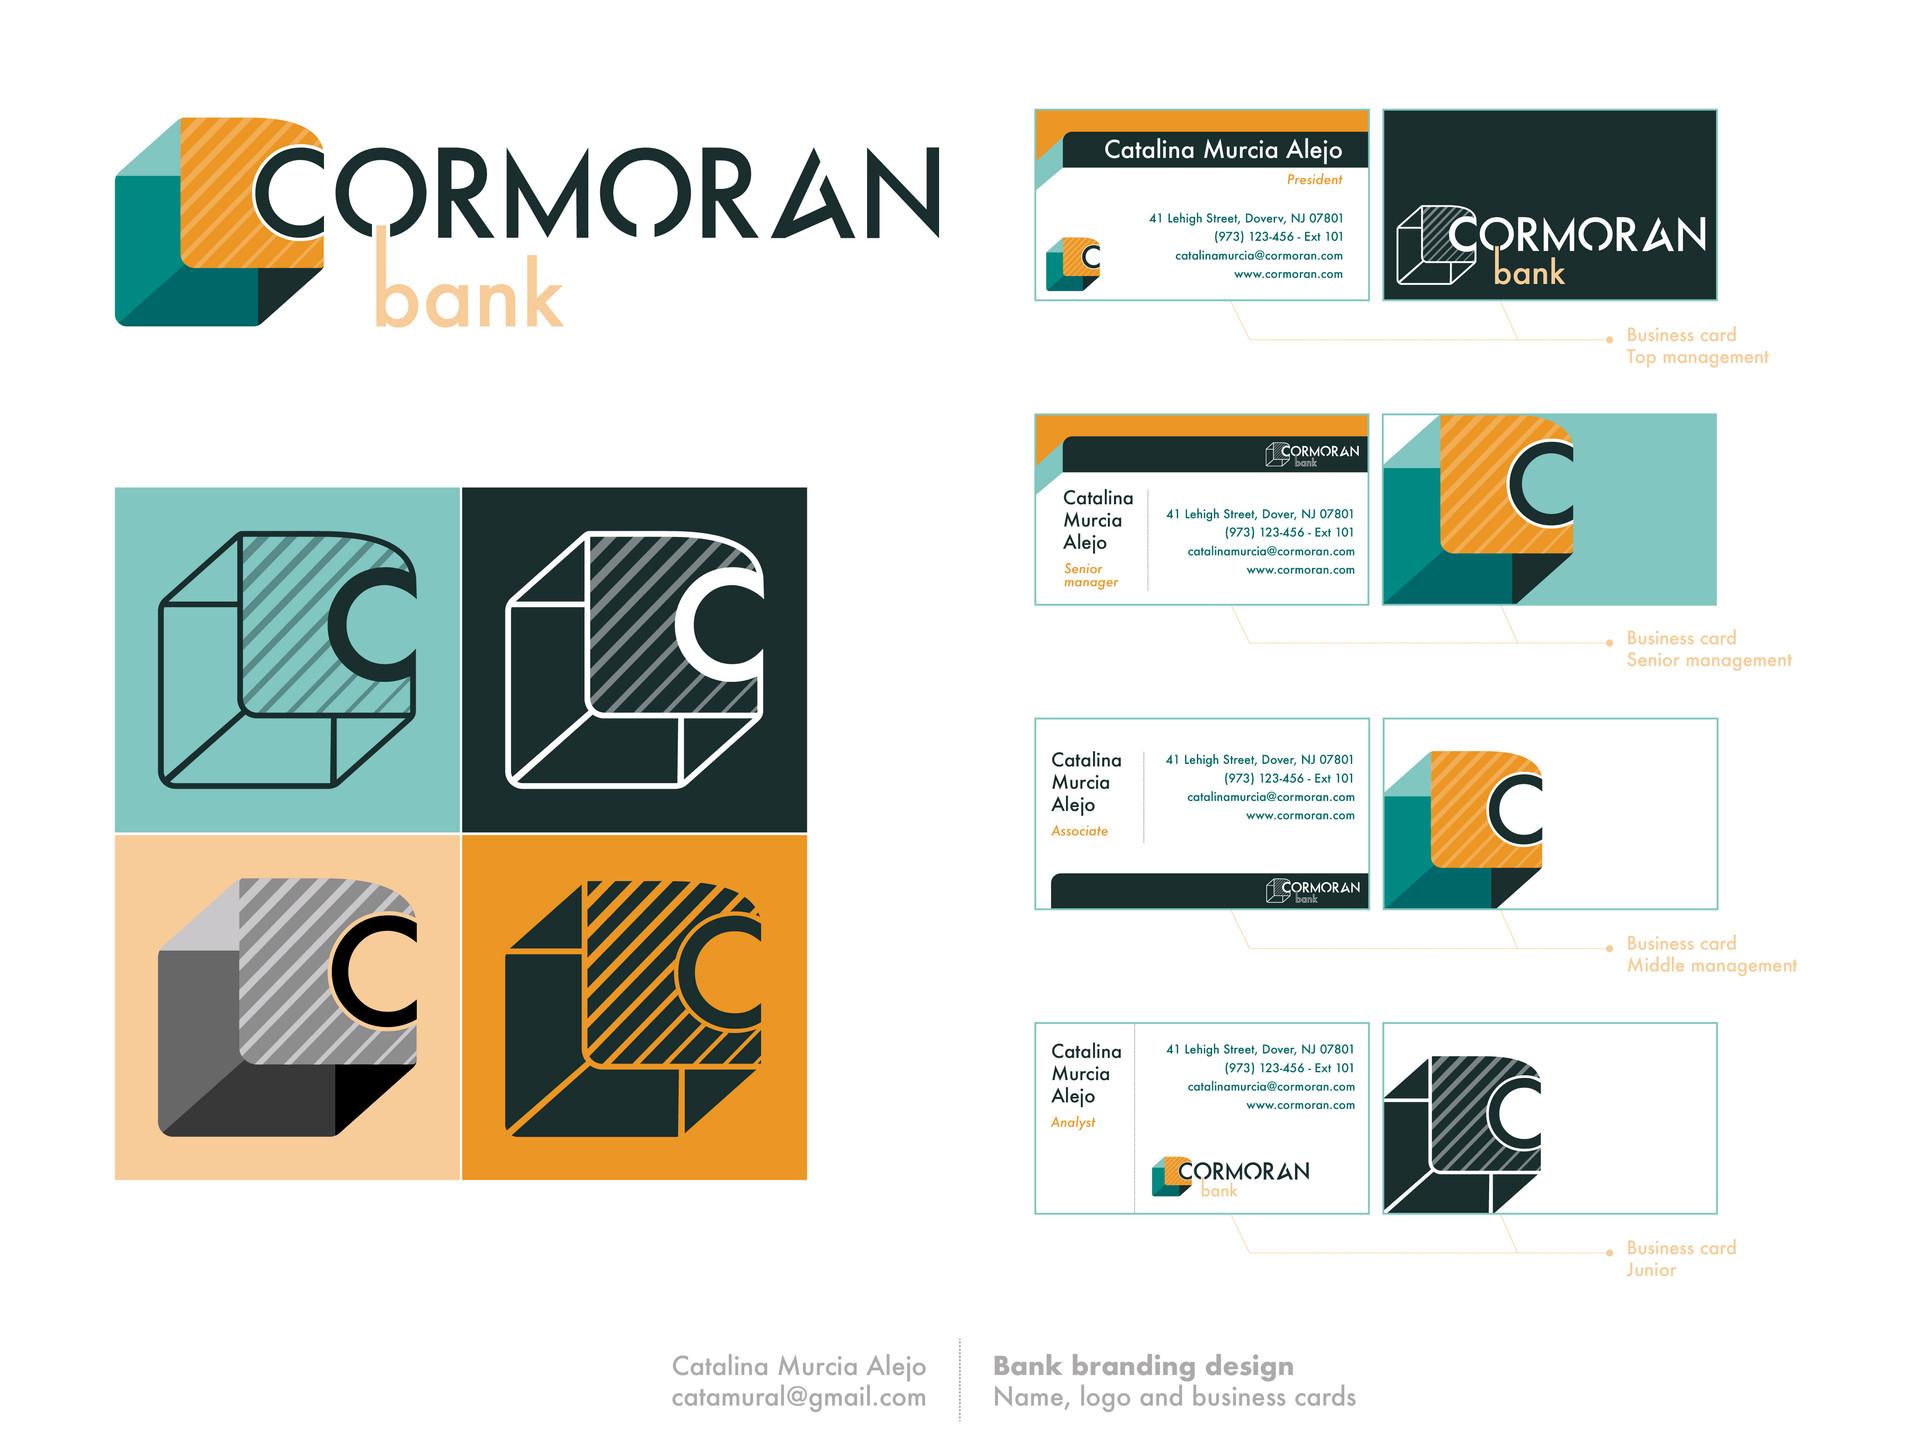 GraphicDesign-02.jpg